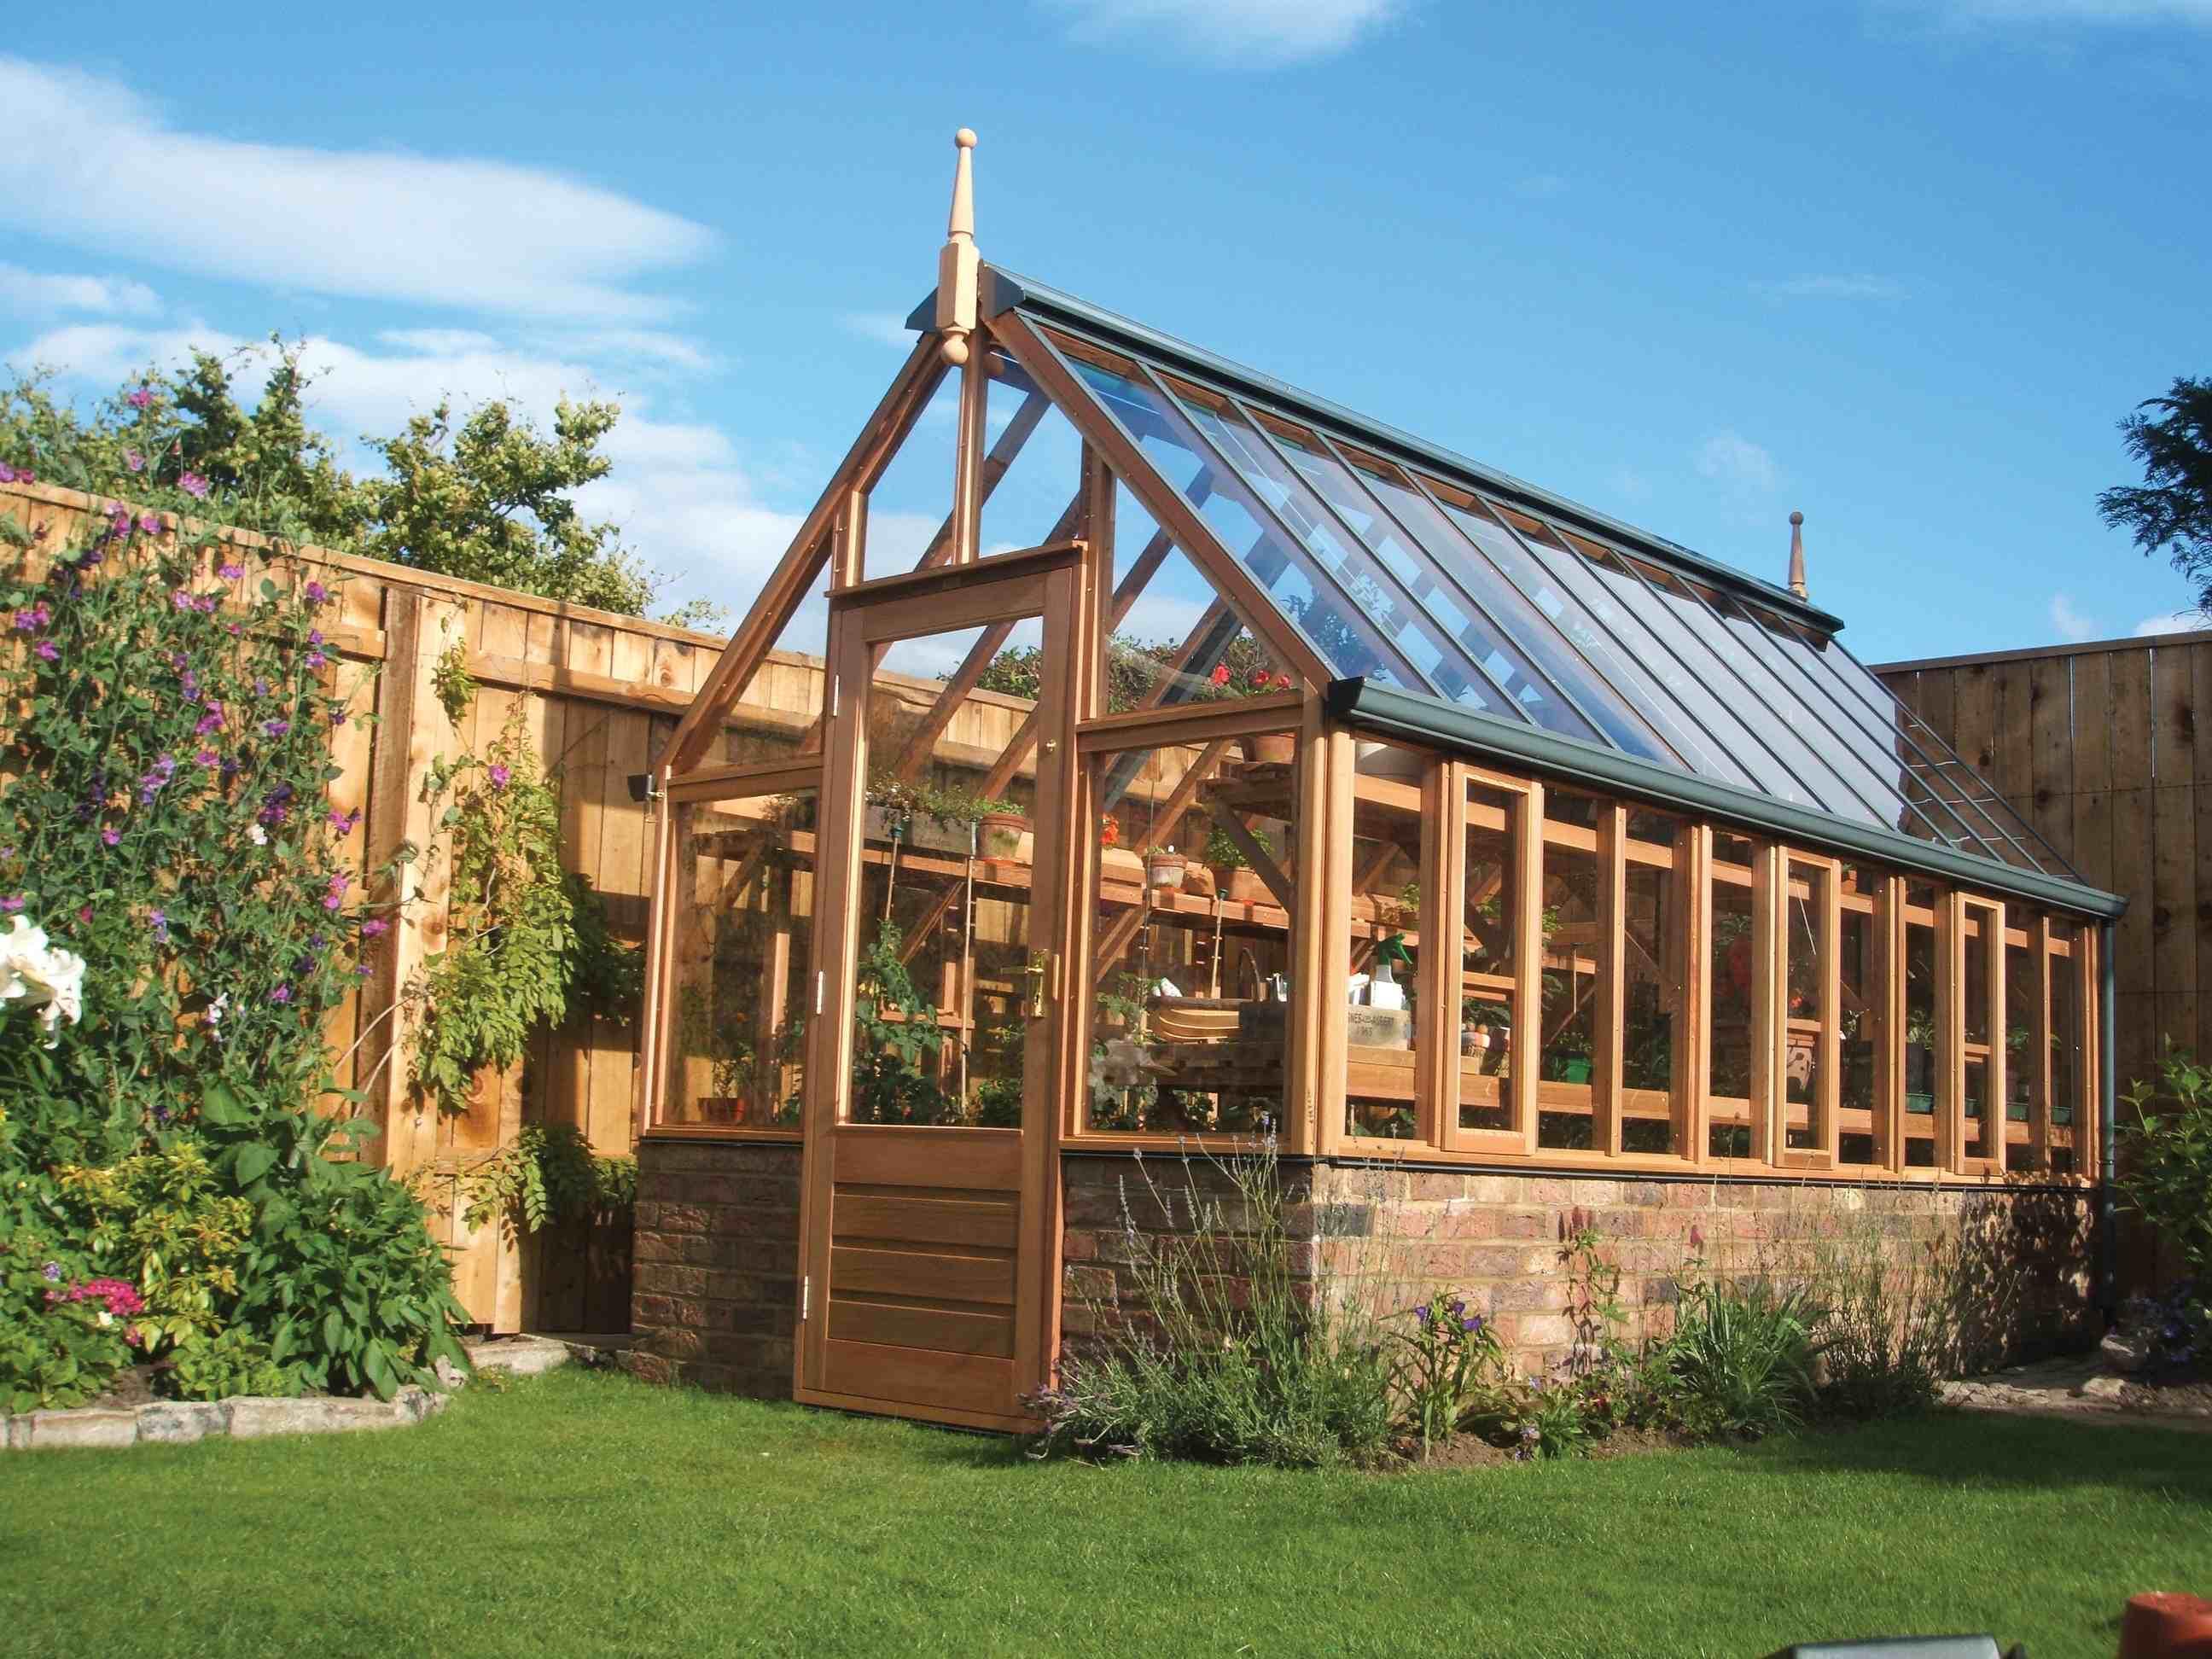 serre de jardin en bois gabriel ash mod le wisley lionel coulot gardens. Black Bedroom Furniture Sets. Home Design Ideas